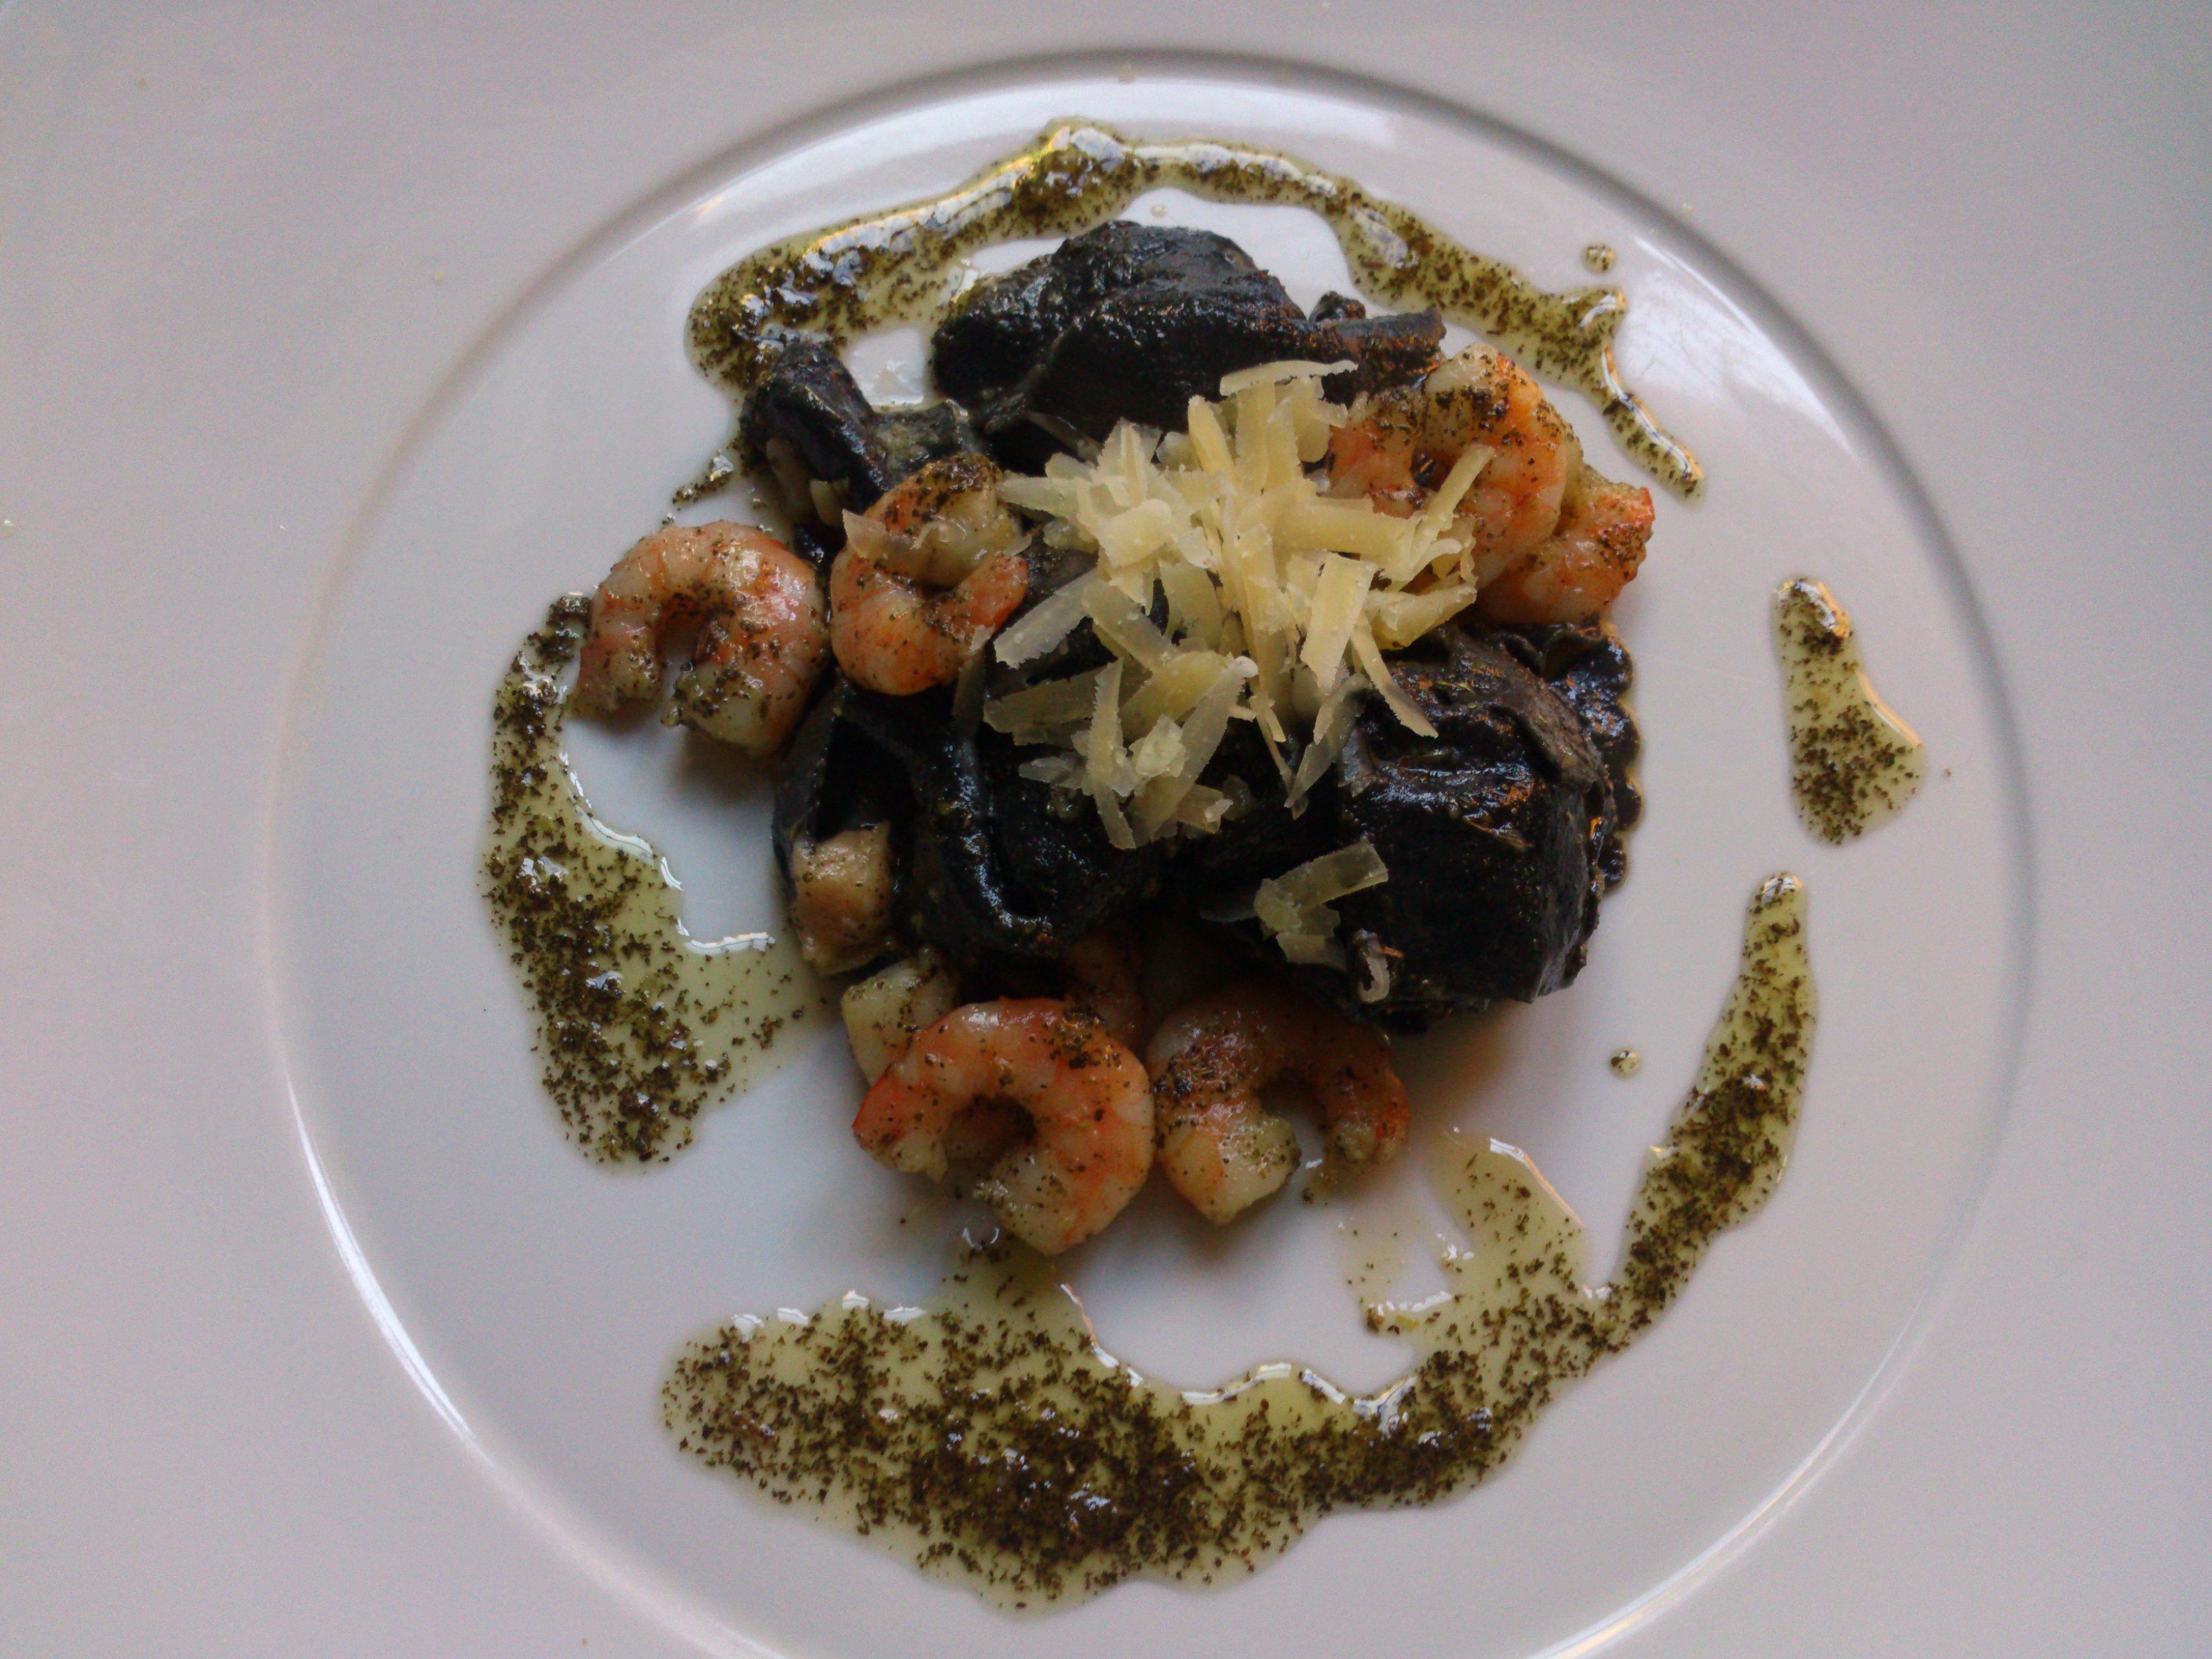 Tortellini de tinta de sepia rellenos de salmón ,con salsa pesto y gambas